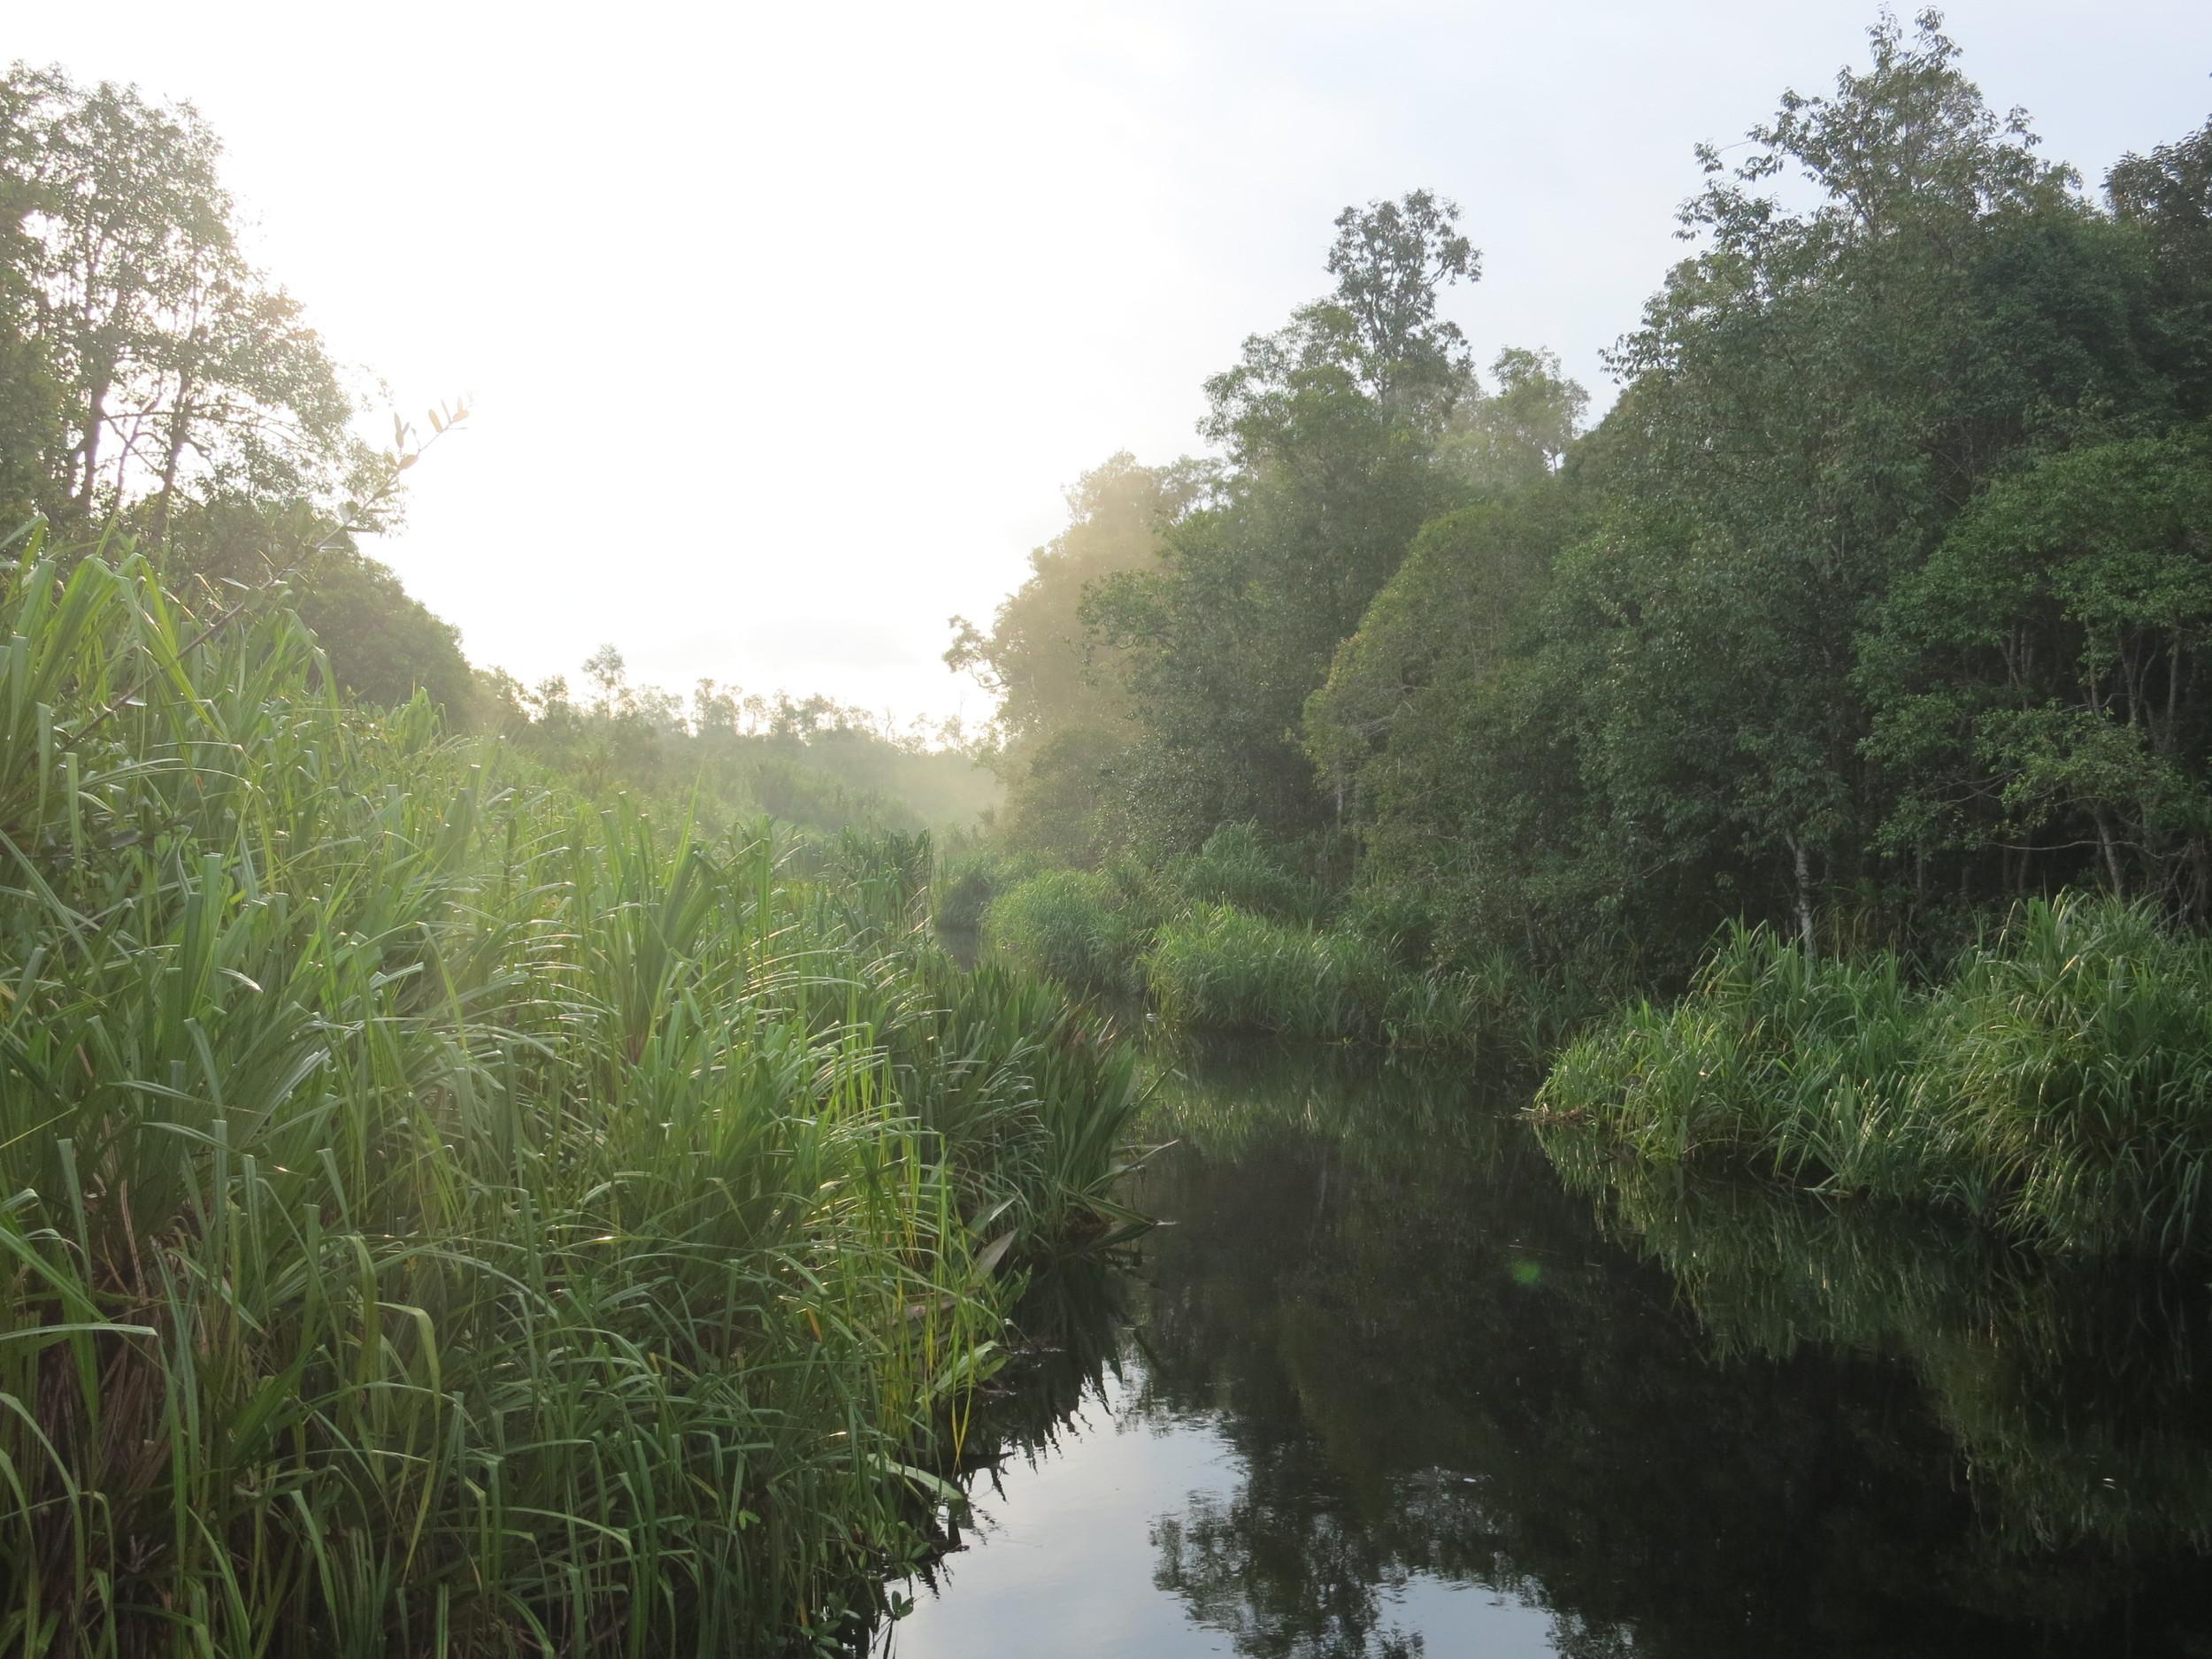 Sunrise on the black river